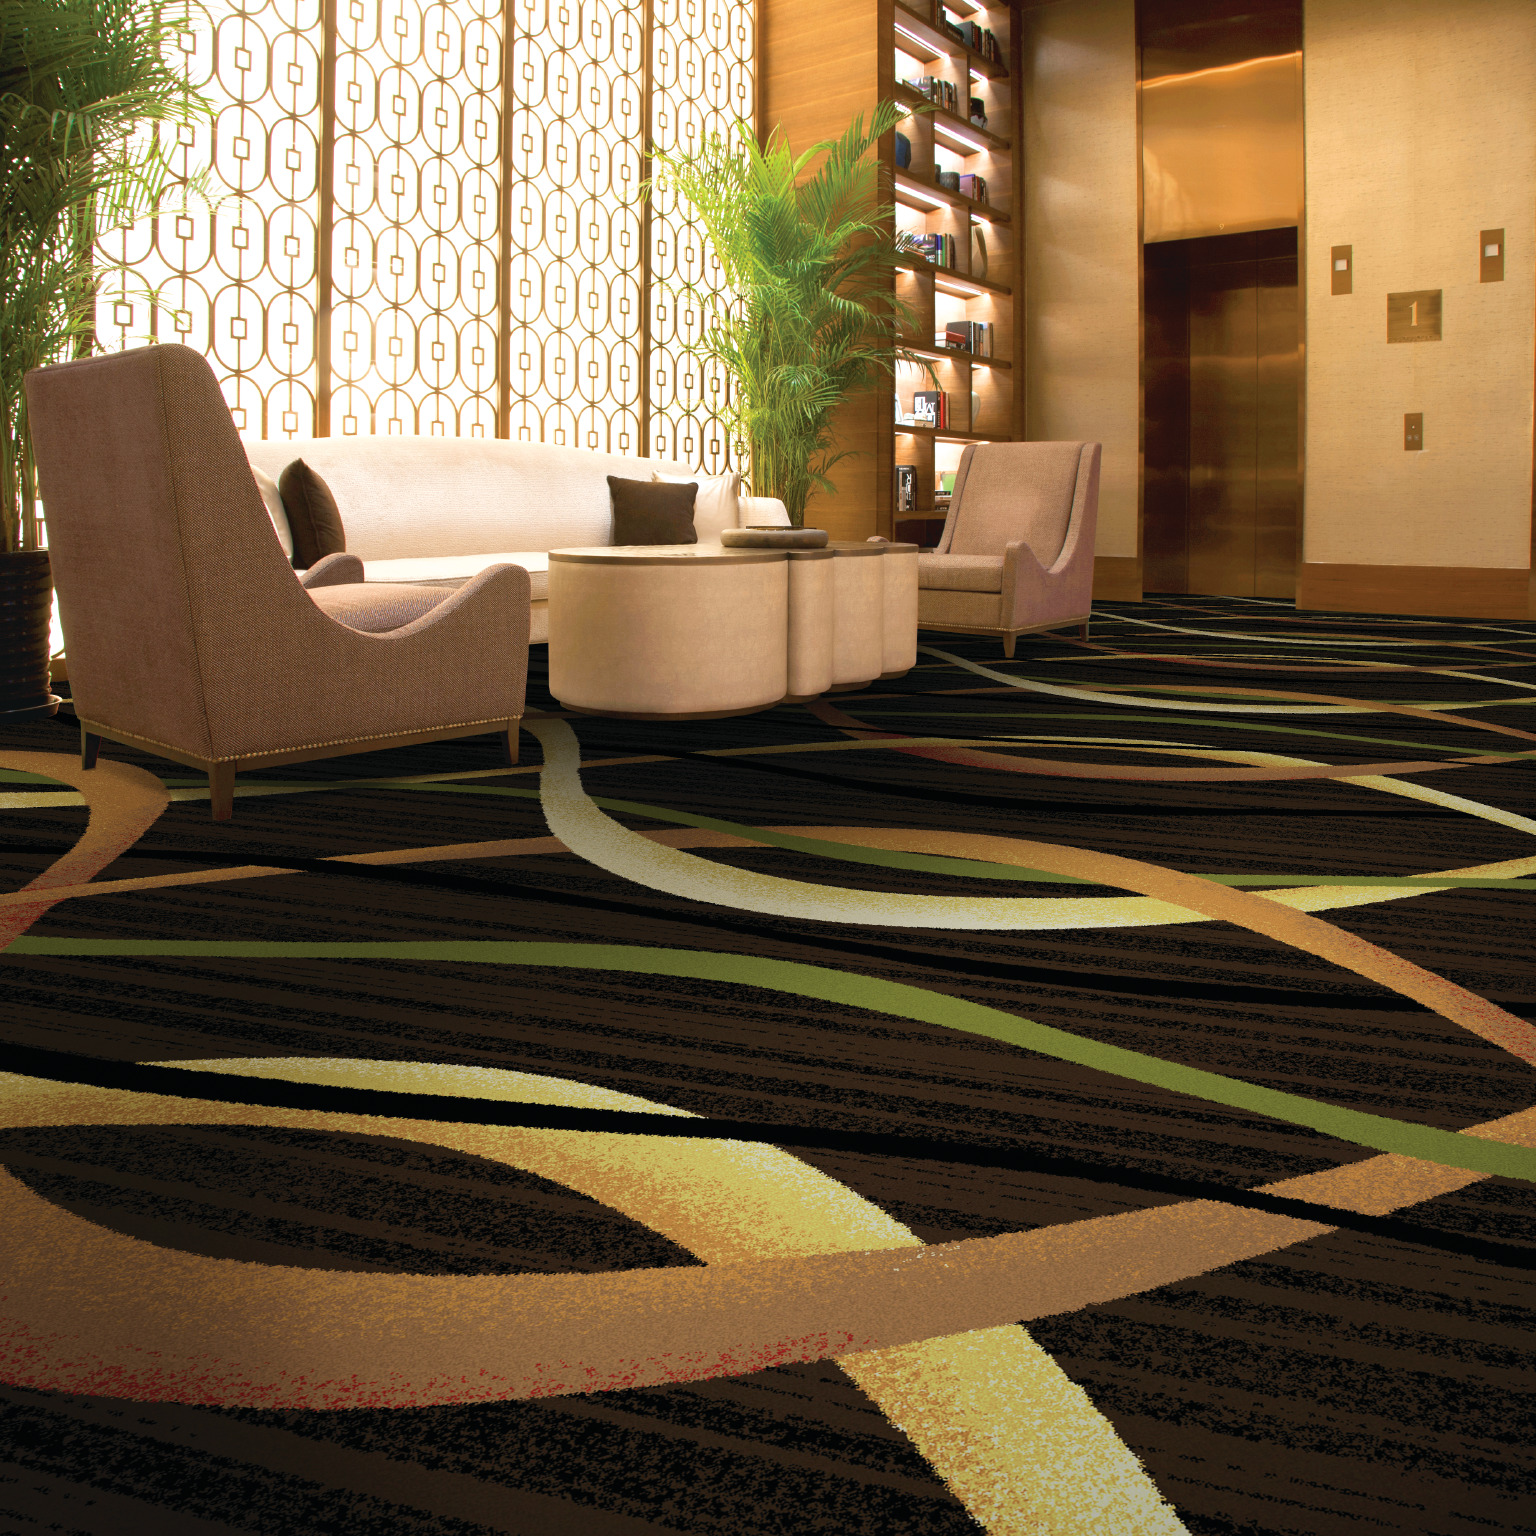 Endeavor Ii Dalton Hospitality Carpet